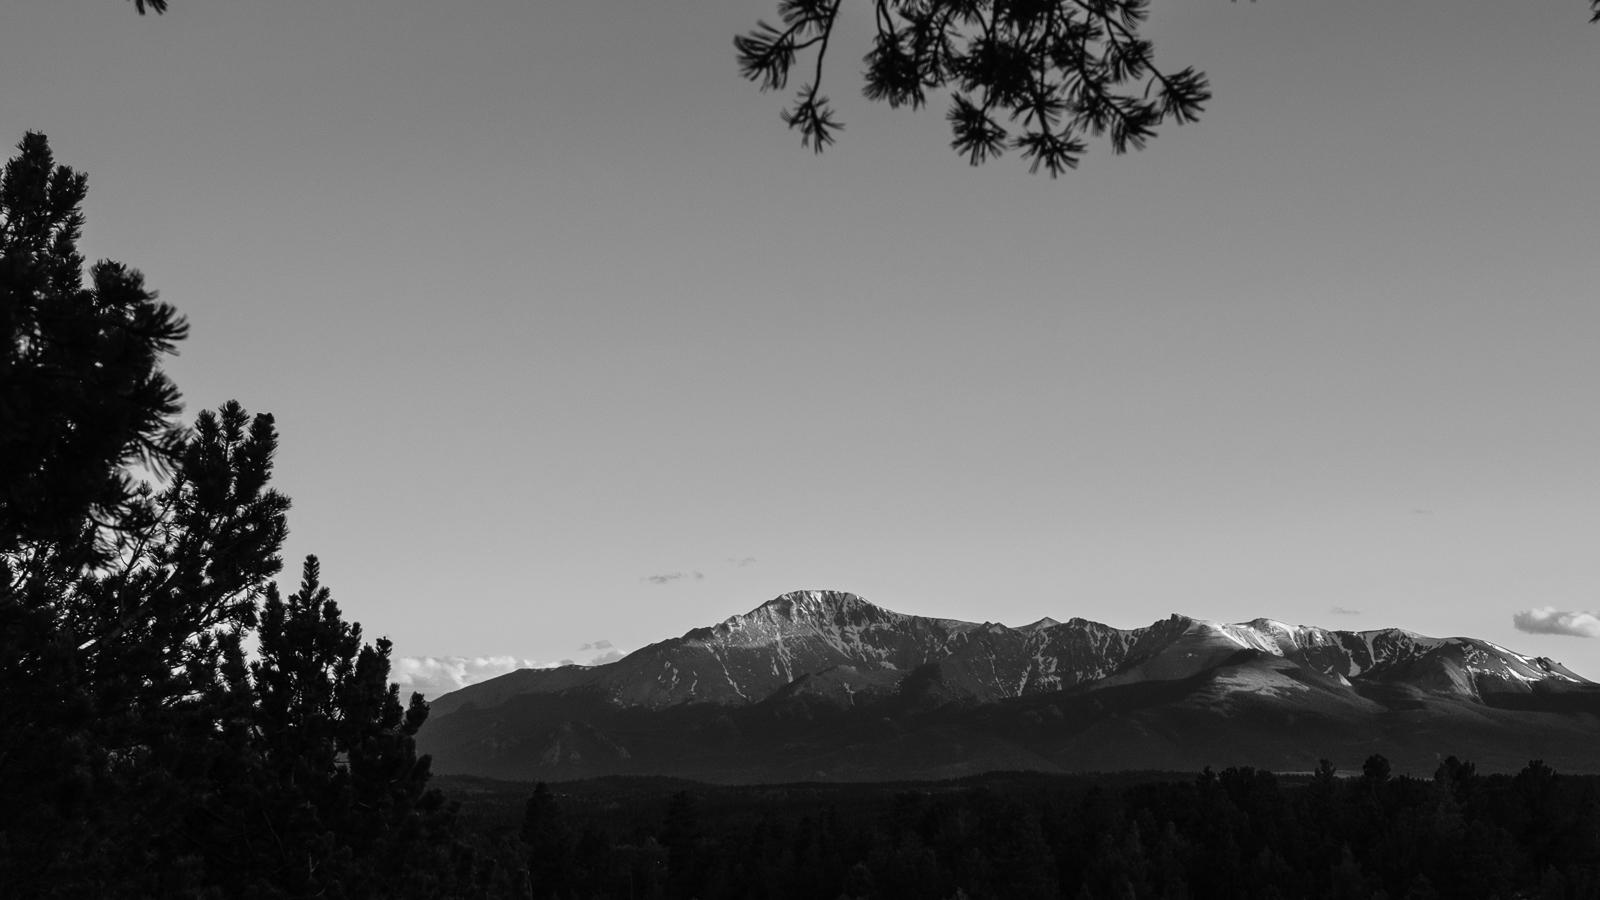 Day 175 - 365 Day B&W Photo Challenge - Sunset views of Pikes Peak from Rampart Range-  Fujifilm X-T3, XF 50-140mm f/2.8, Acros R Film Simulation